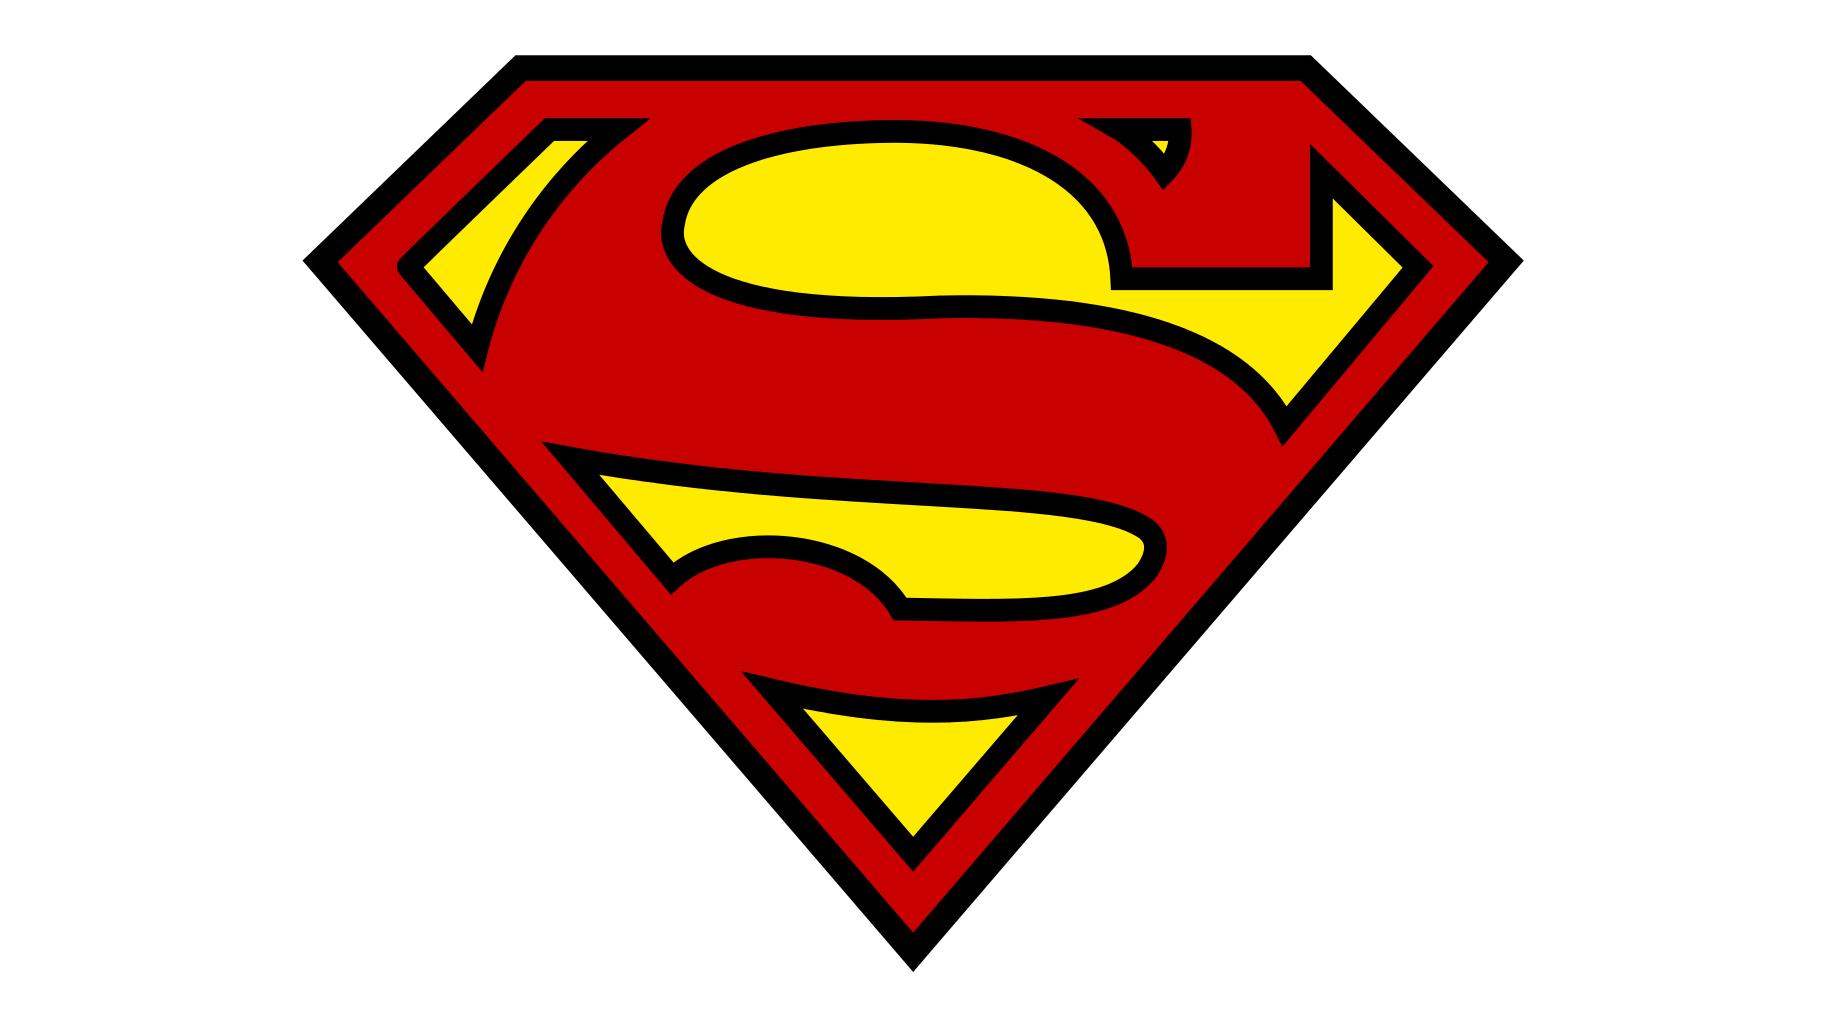 behind the scenes on seven superhero logos graphic design rh avantgraphic com create a superhero logo online create a superhero symbol